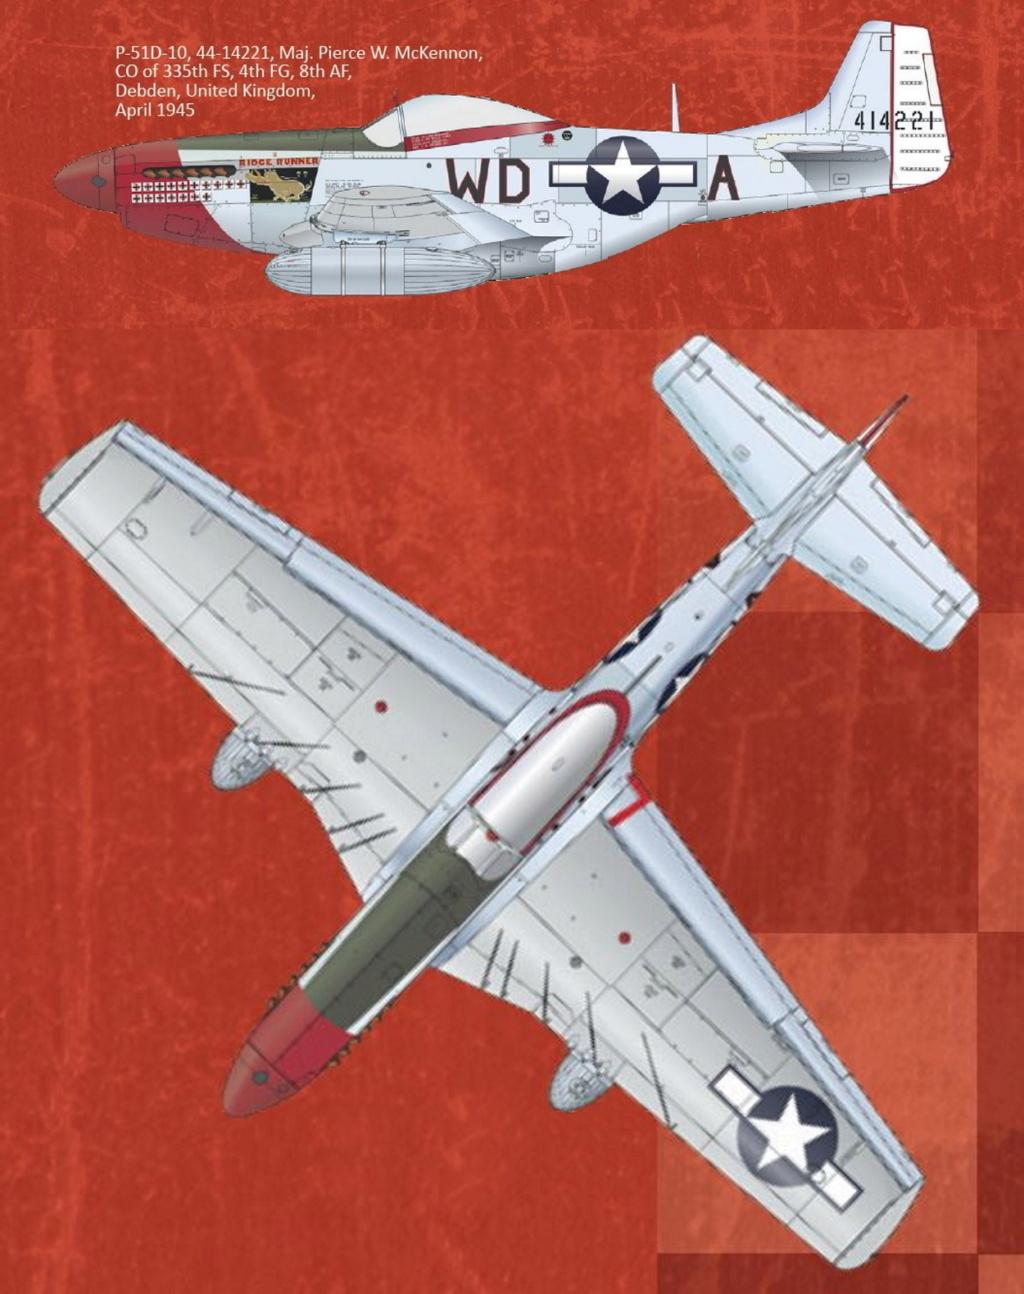 NORTH AMERICAN P-51 MUSTANG P51-5-11